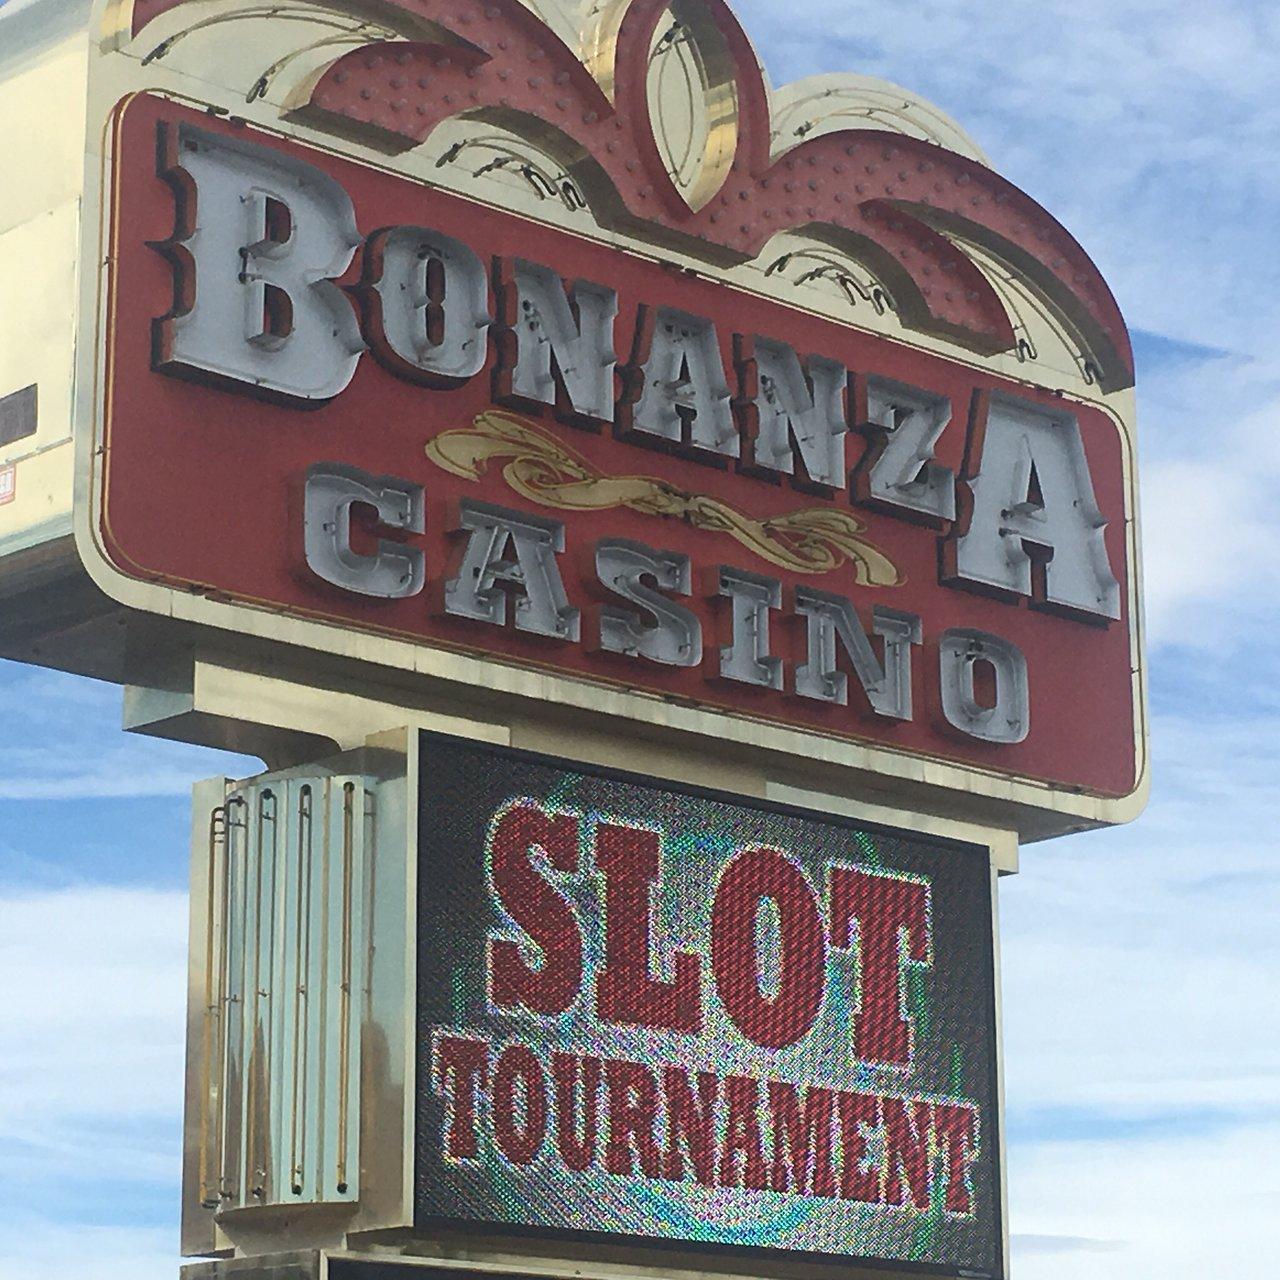 Bonanza casino fallon nv binions casino horseshoe hotel